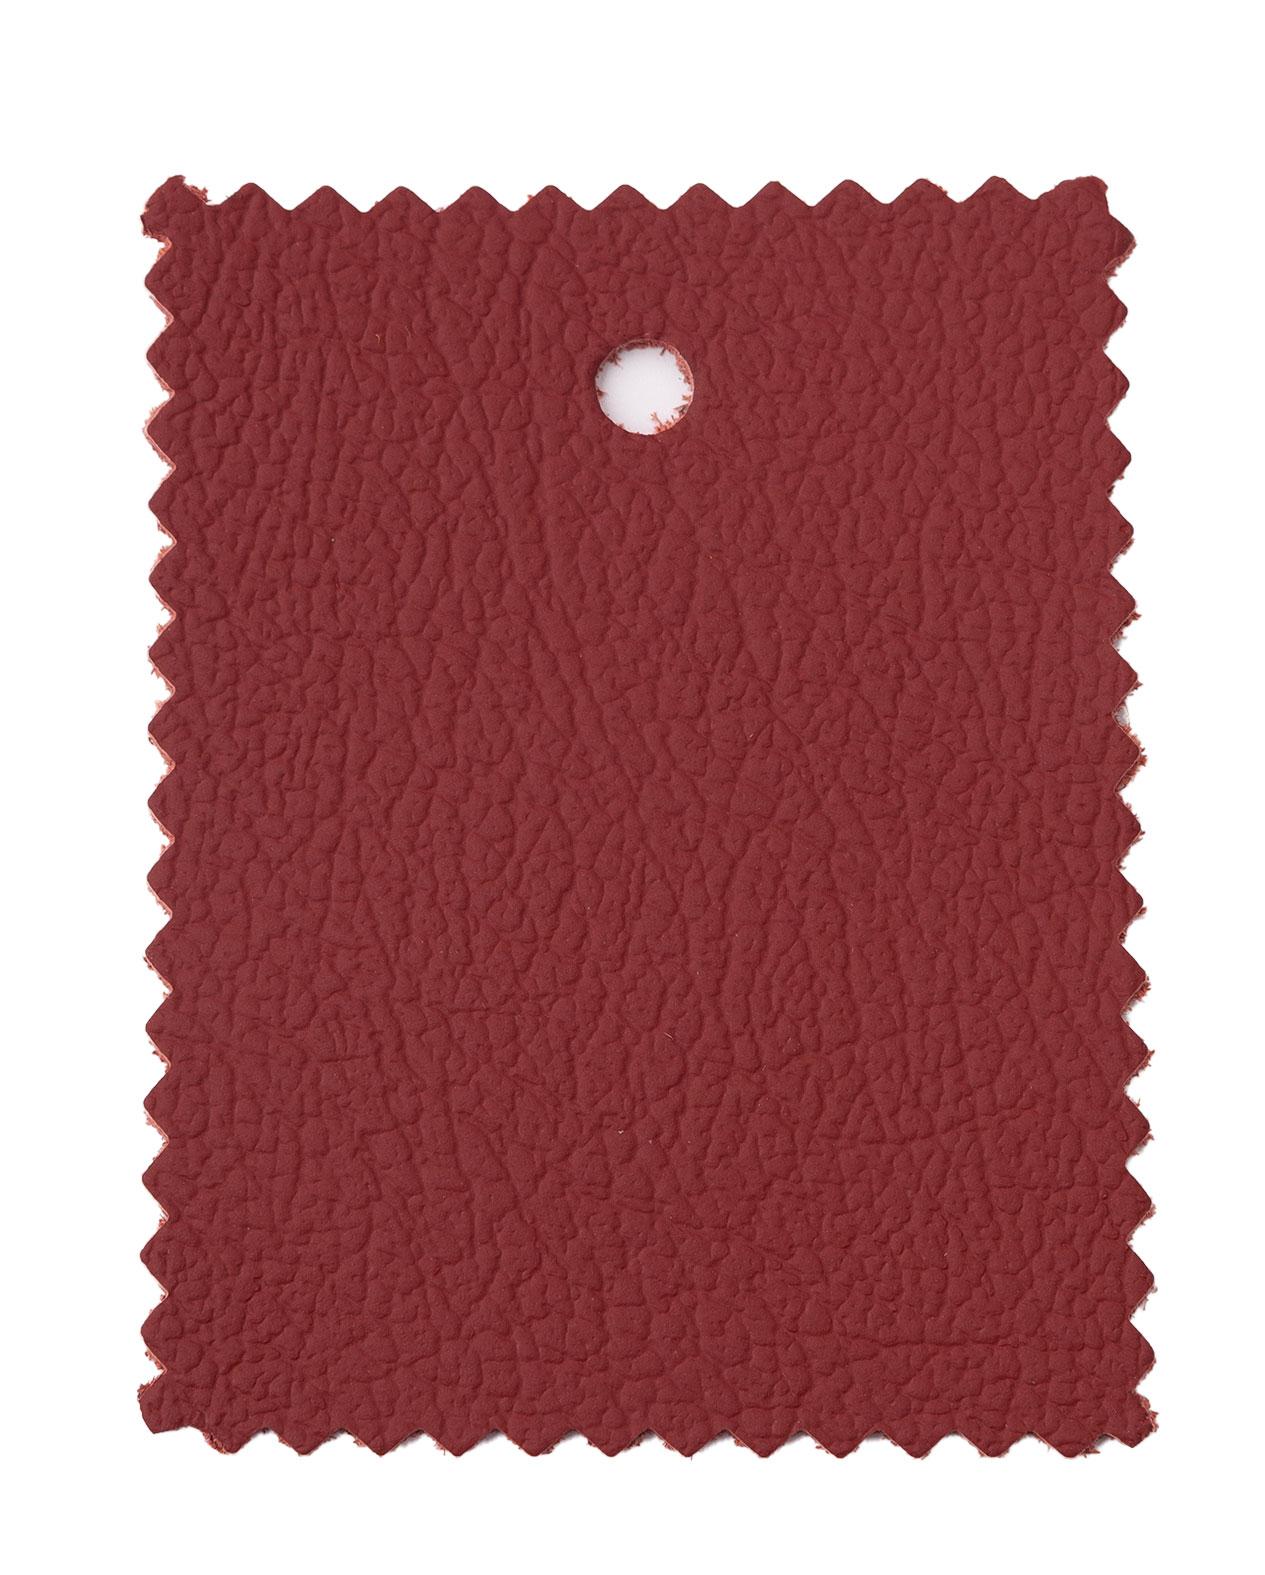 Abbildung mb-old-3000-rot